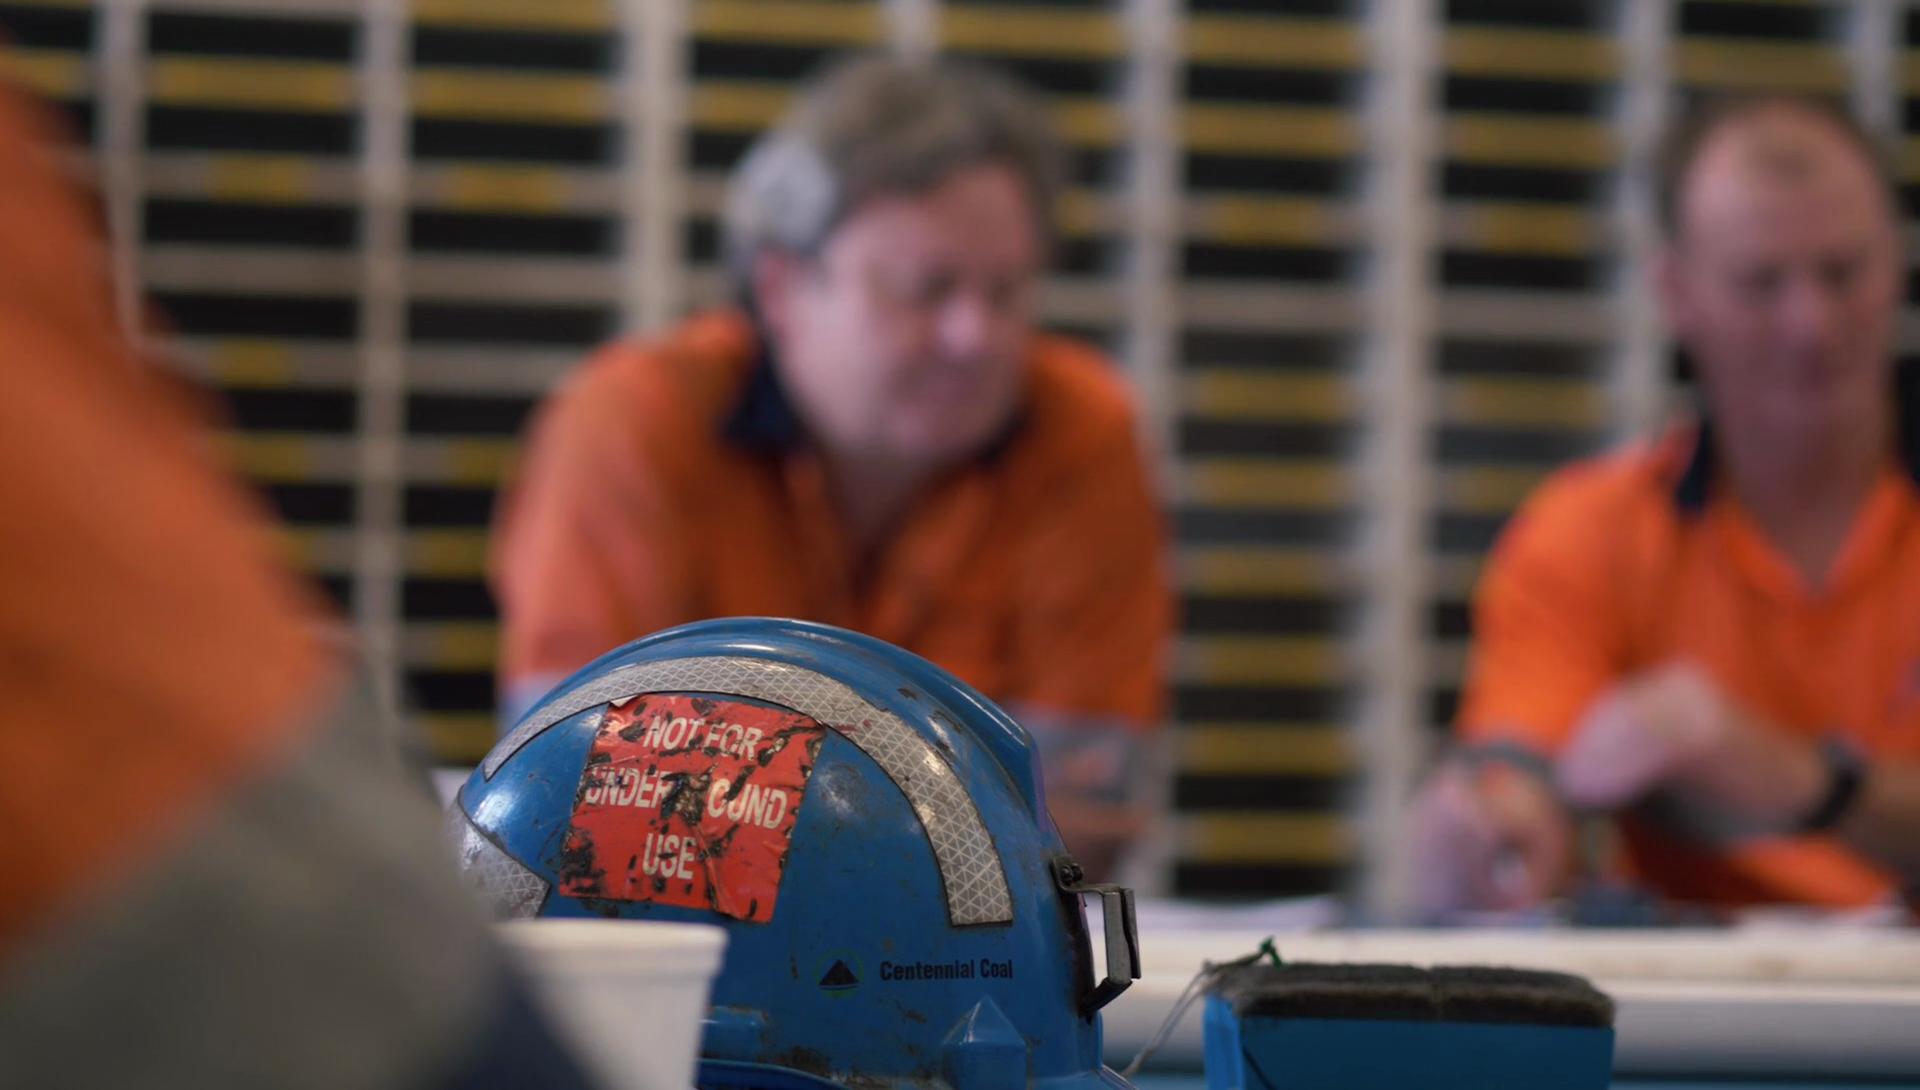 Pulse Analytics - Transforming performance at Centennial Coal